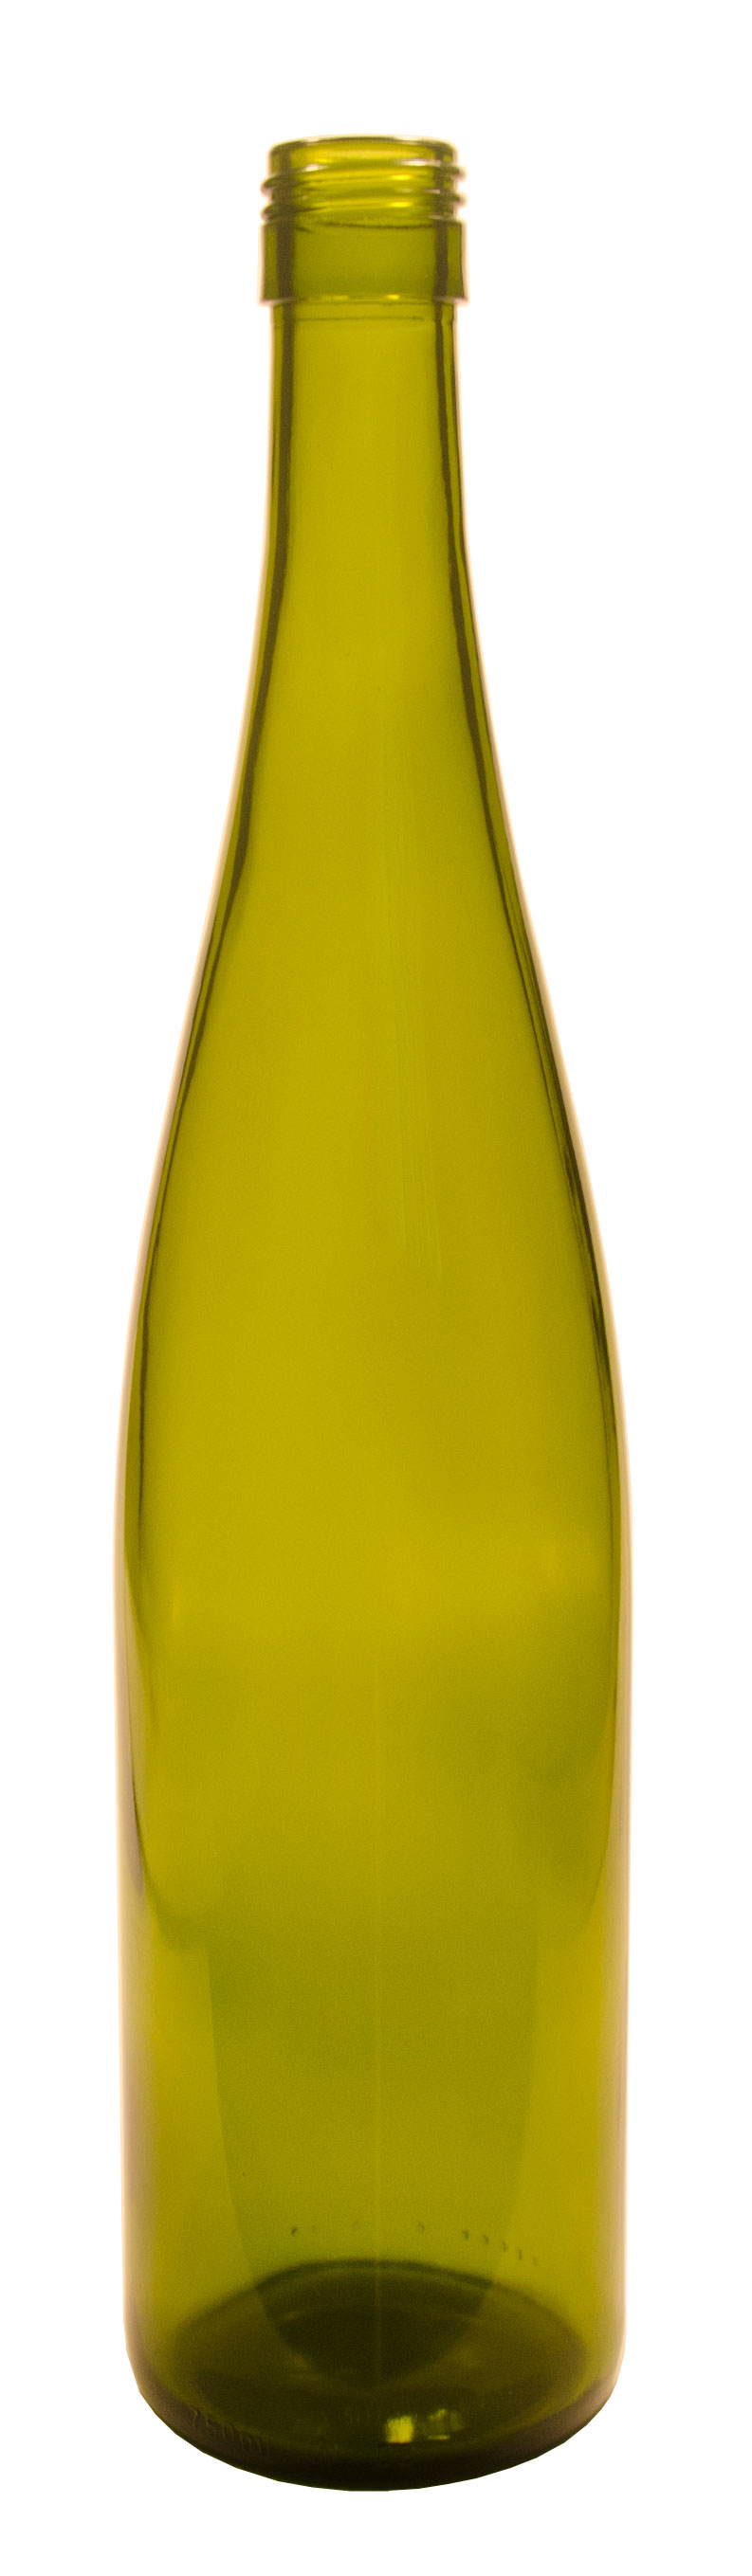 750ml_Marcello_hock_wine_bottle_CG